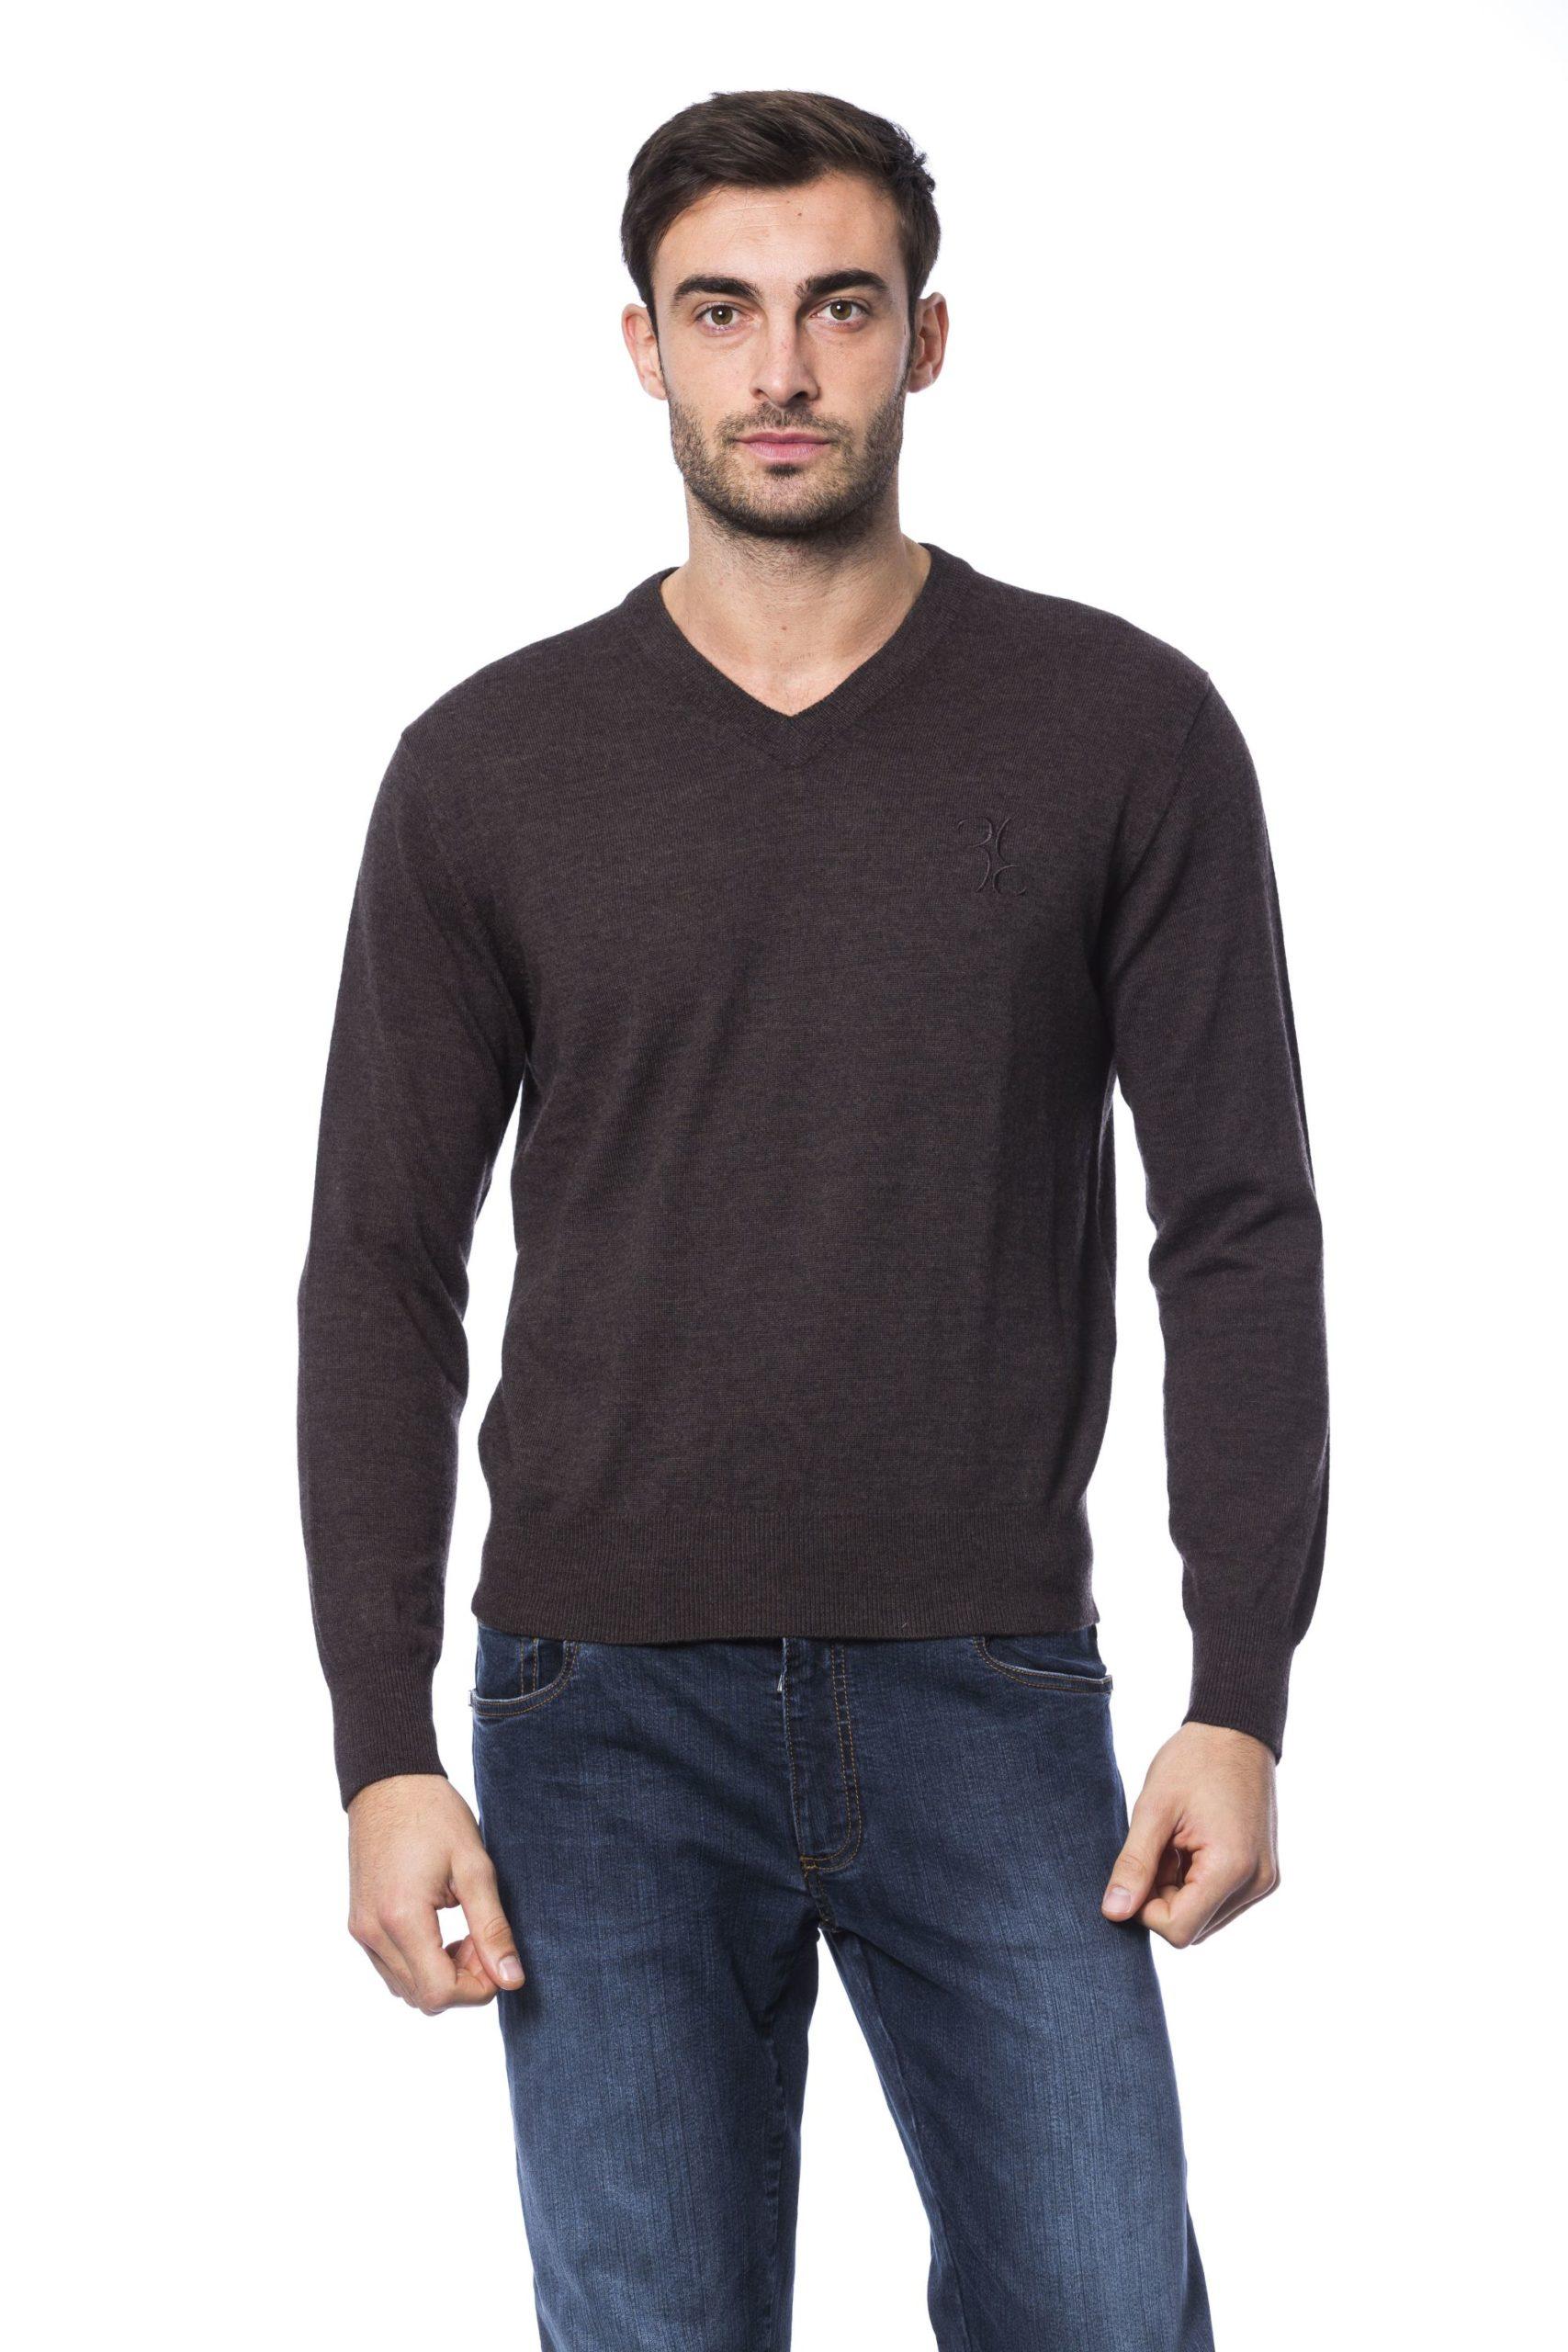 Billionaire Italian Couture Men's Marr Sweater Brown BI1271982 - M